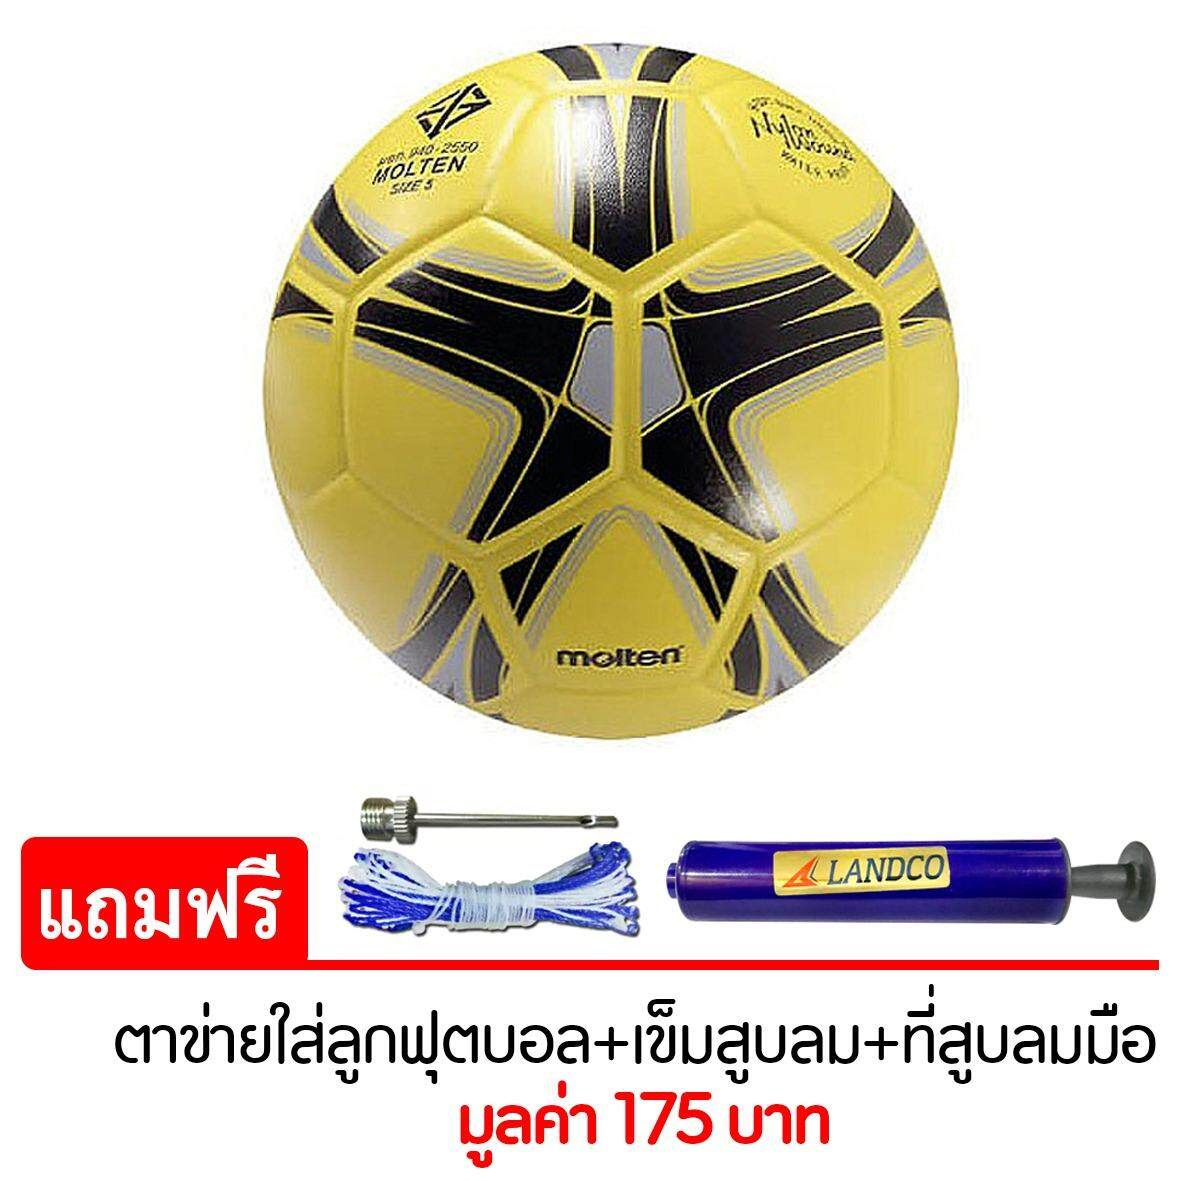 Molten ฟุตบอลFootball Mot Pvc F5Y1505 Yk เบอร์5 แถมฟรี ตาข่ายใส่ลูกฟุตบอล เข็มสูบสูบลม สูบมือ Spl รุ่น Sl6 สีน้ำเงิน ถูก